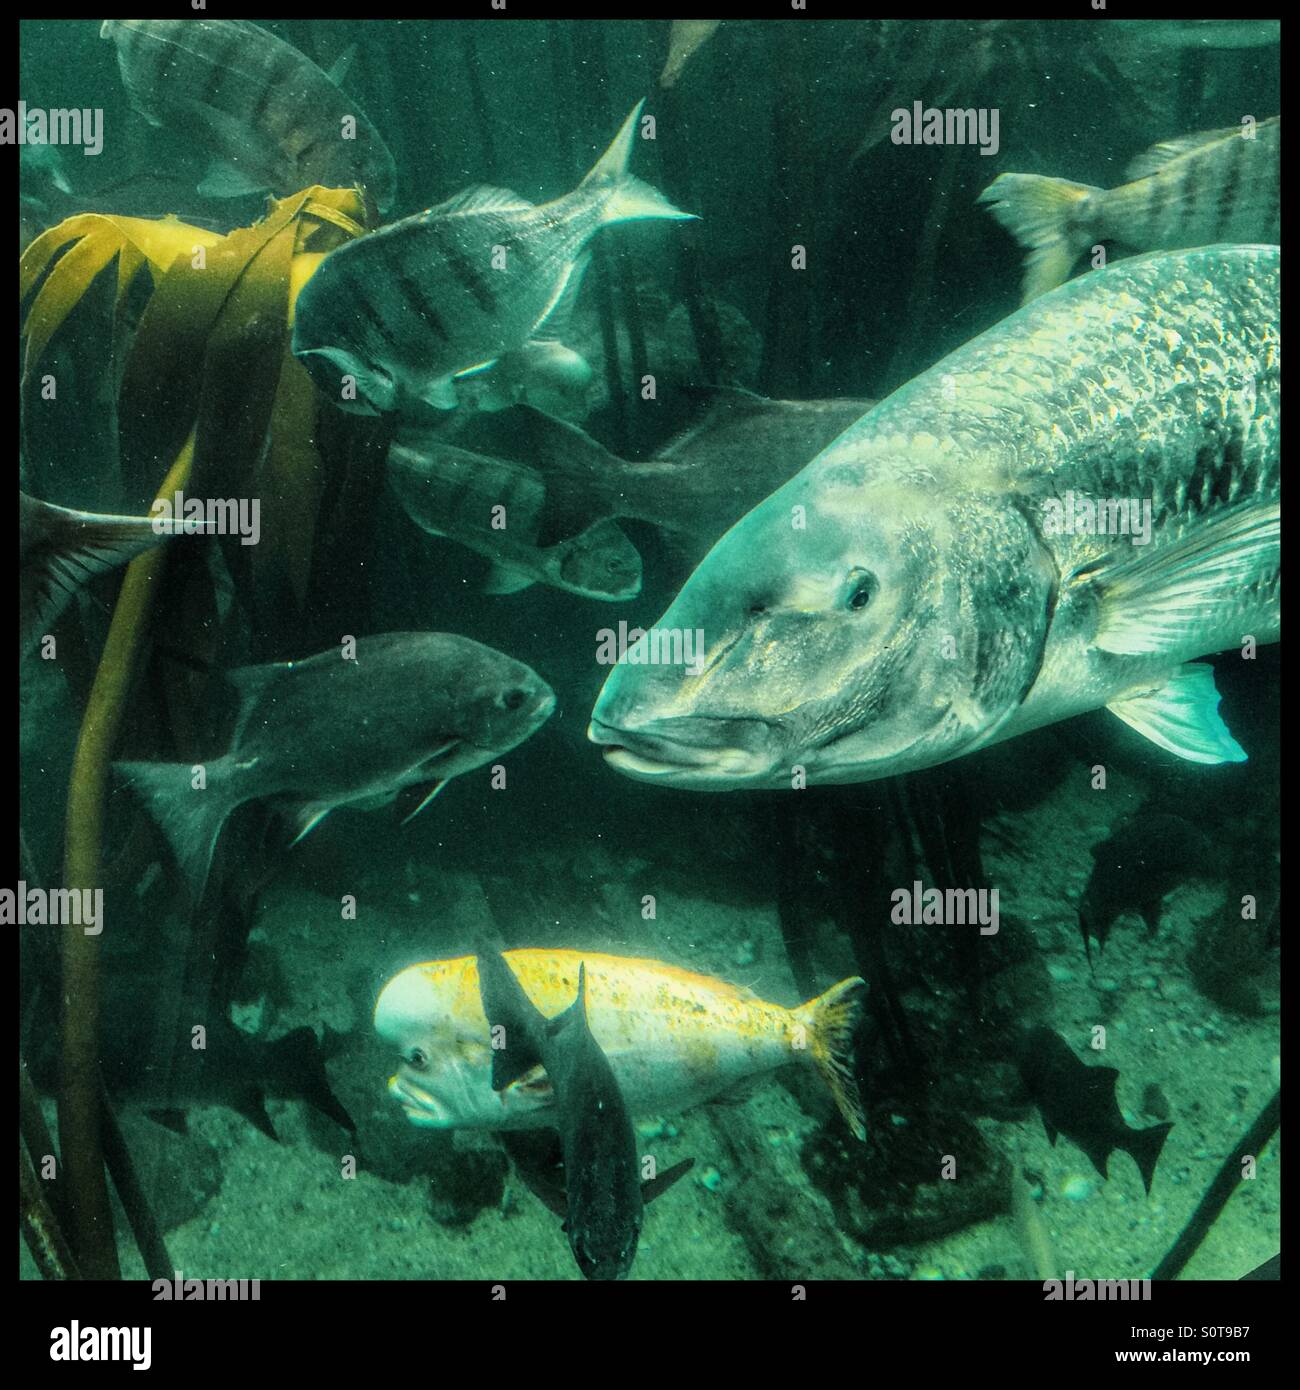 Aquarium fish tank in south africa - Fish Tank In Two Oceans Aquarium Cape Town South Africa